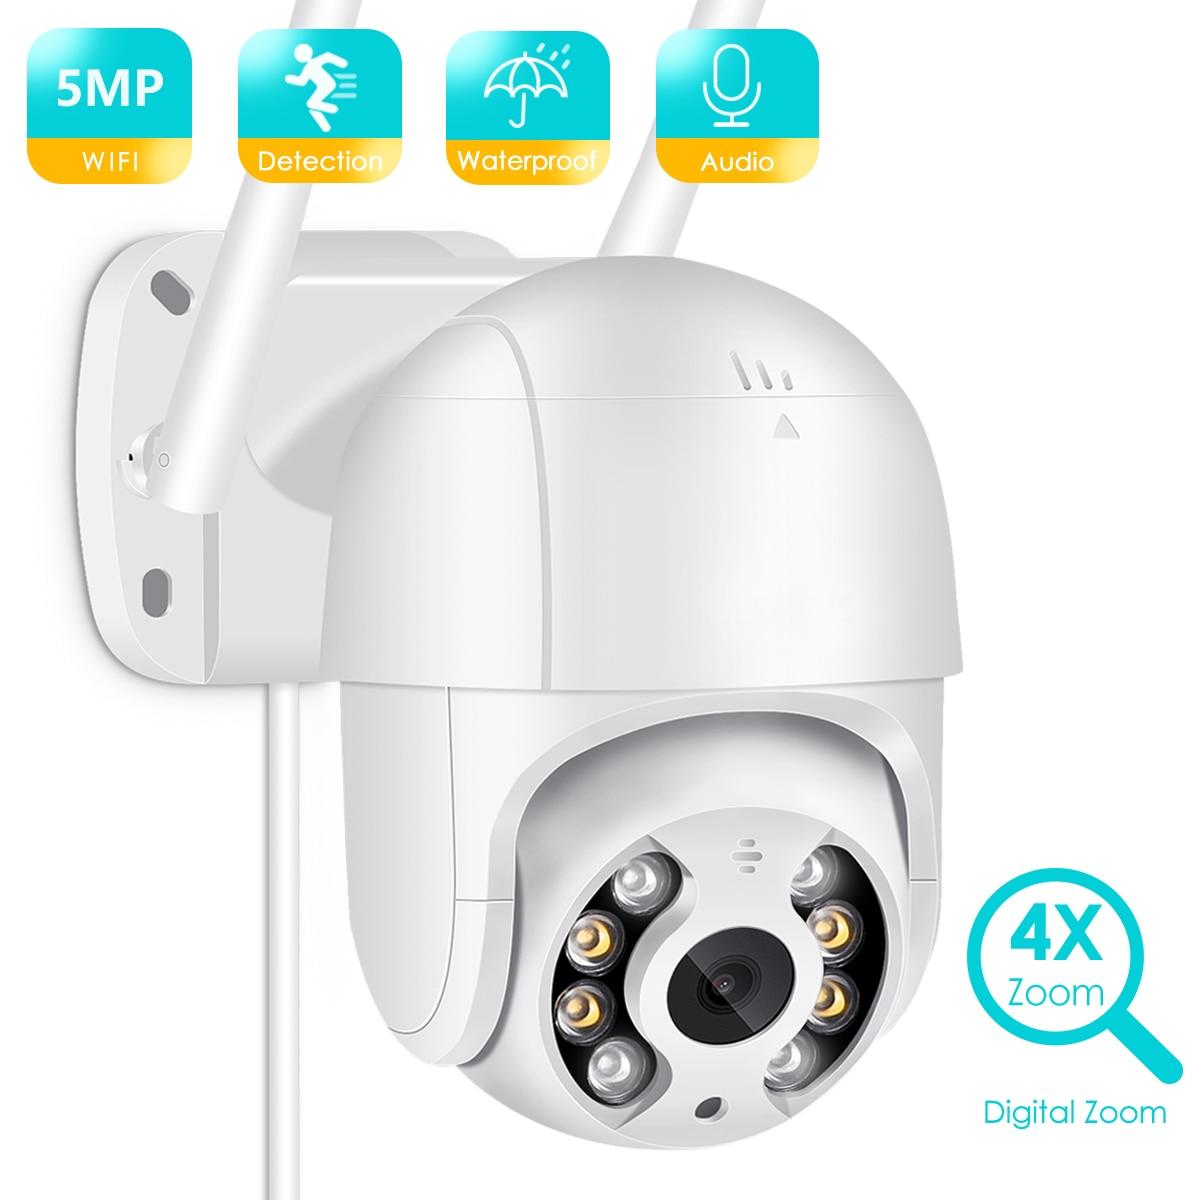 BESDER 5MP PTZ IP Camera Wifi Outdoor AI Human Detection Audio 1080P Wireless Security CCTV P2P RTSP 4X Digital Zoom Wifi Camera 1